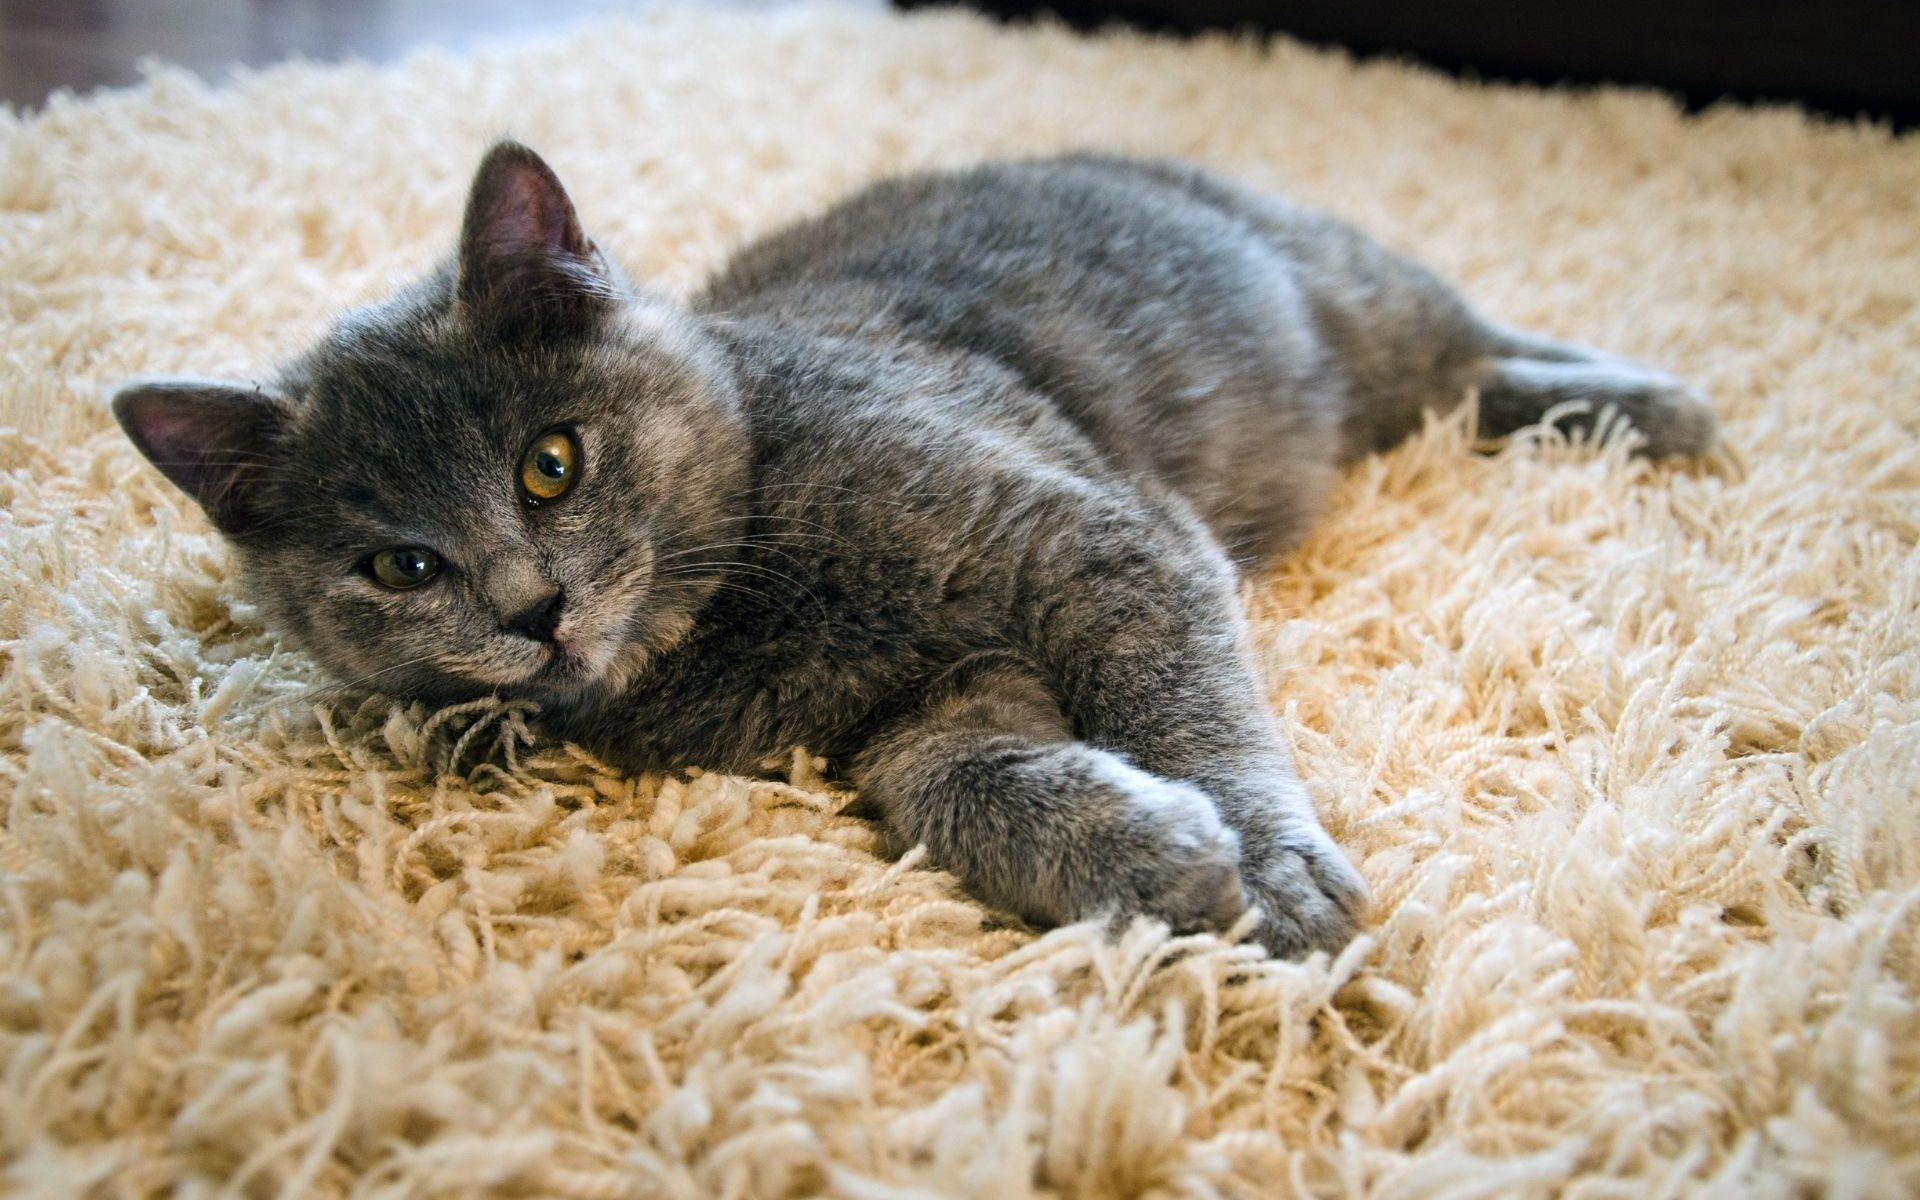 Cute cat lying on a plush carpet